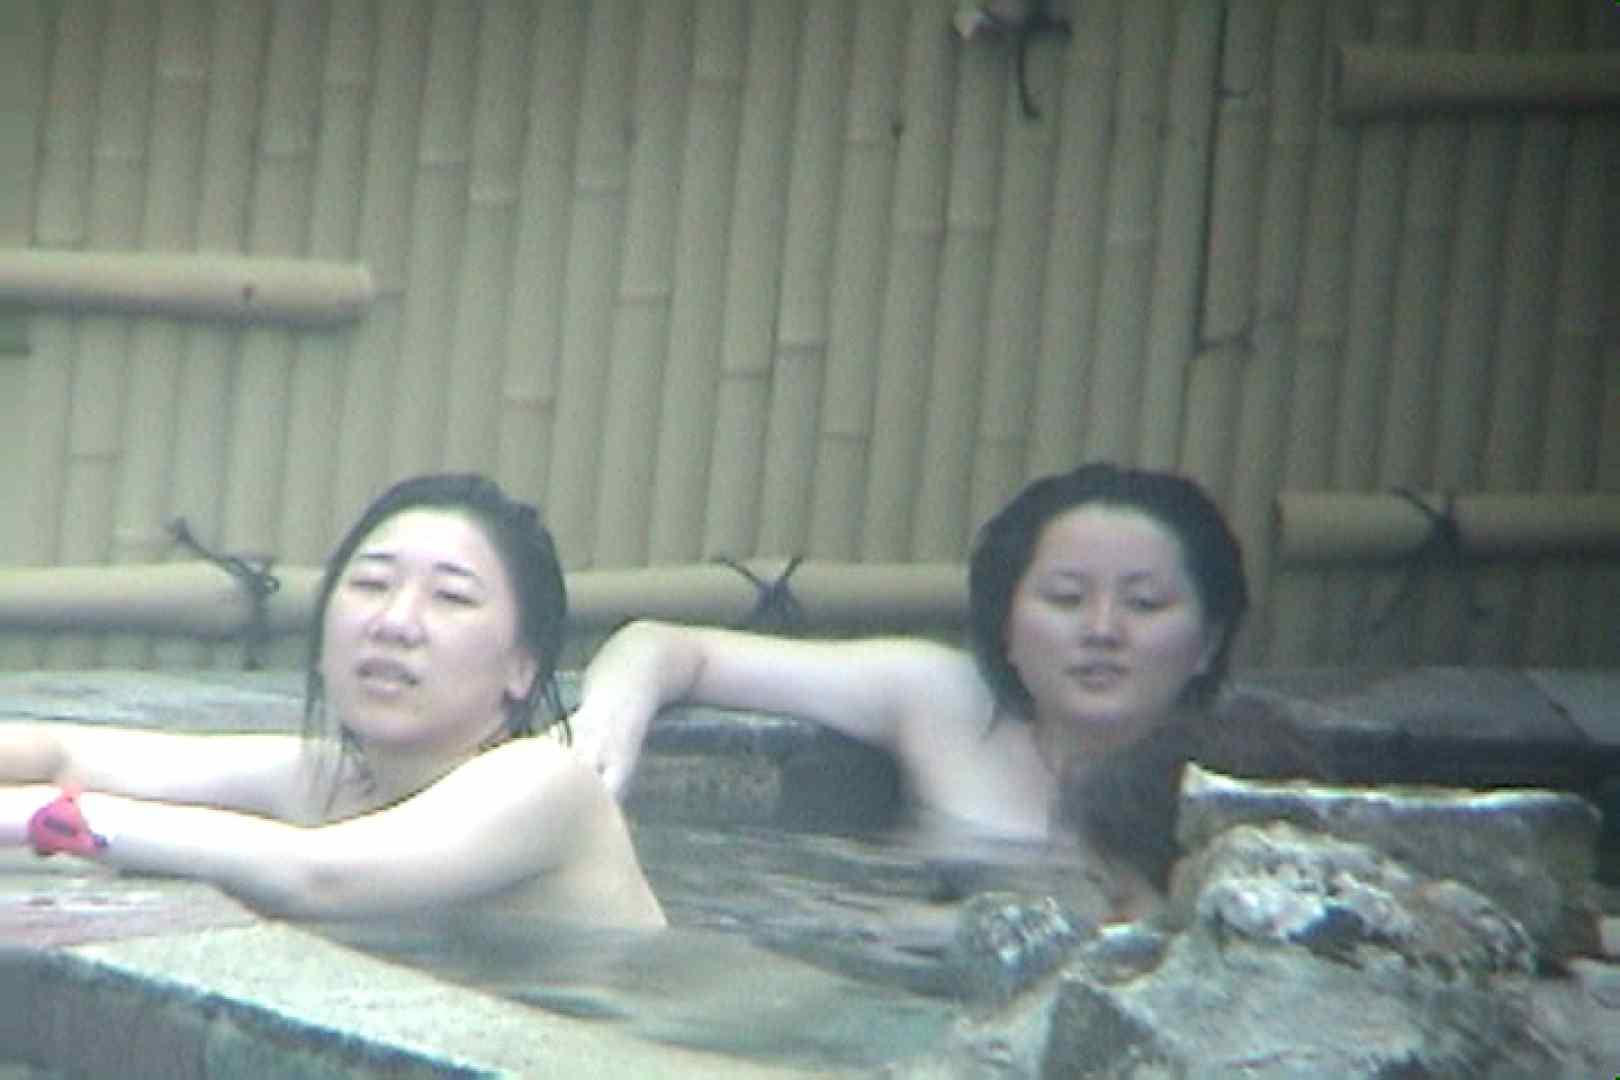 Aquaな露天風呂Vol.107 露天風呂編  111PIX 48